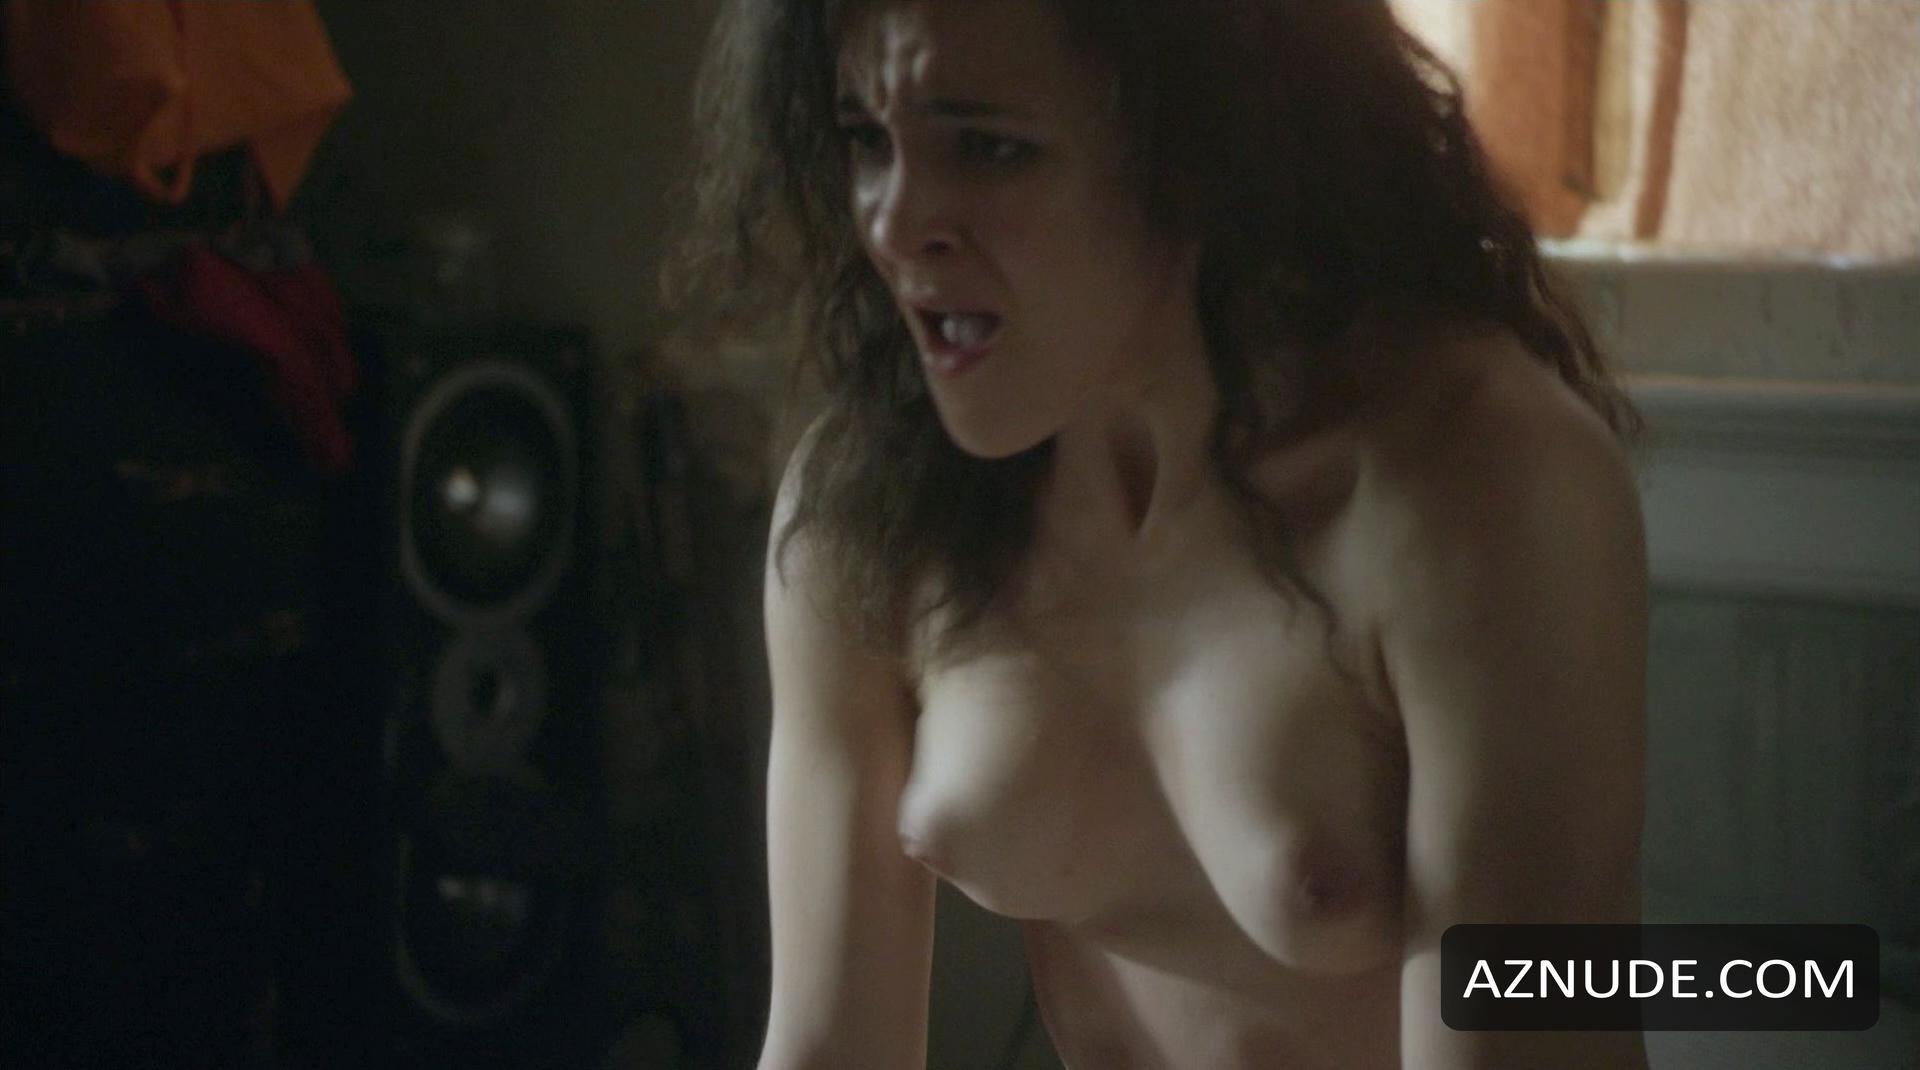 Tits jessica mcnamee